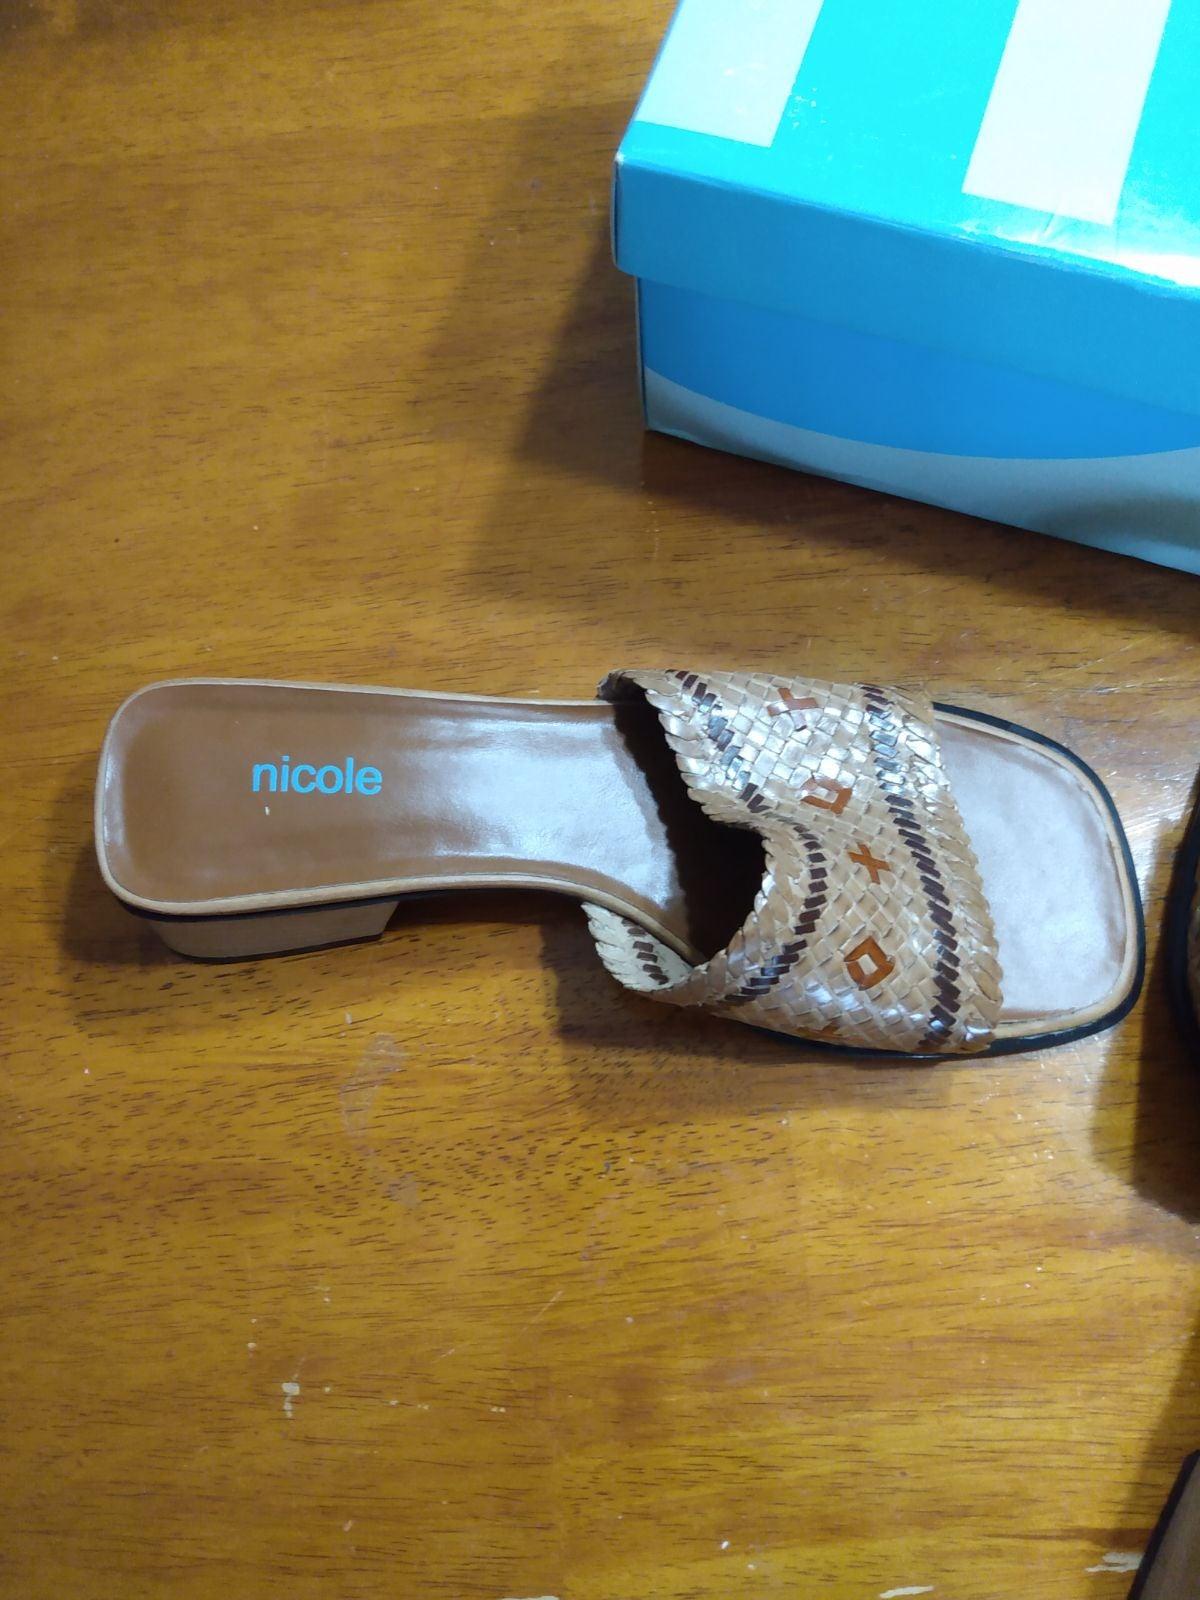 Women's New Nicole Sandals Size 8.5